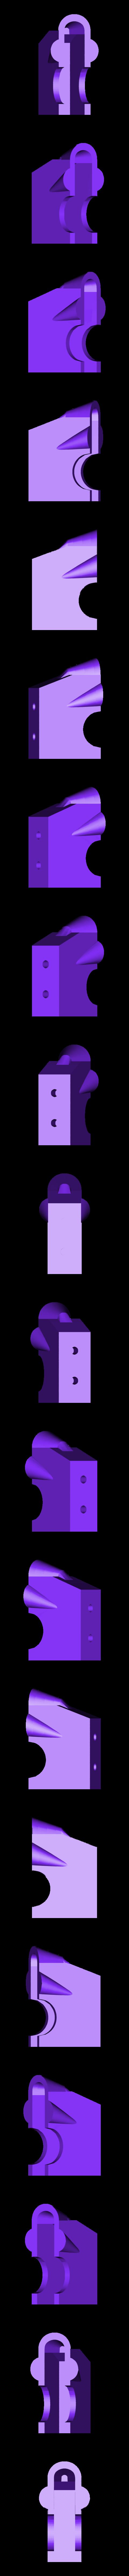 Lightcycle_Frame_Back.STL Download free STL file Lightcycle Model Kit • Design to 3D print, billythemighty3Dprinter